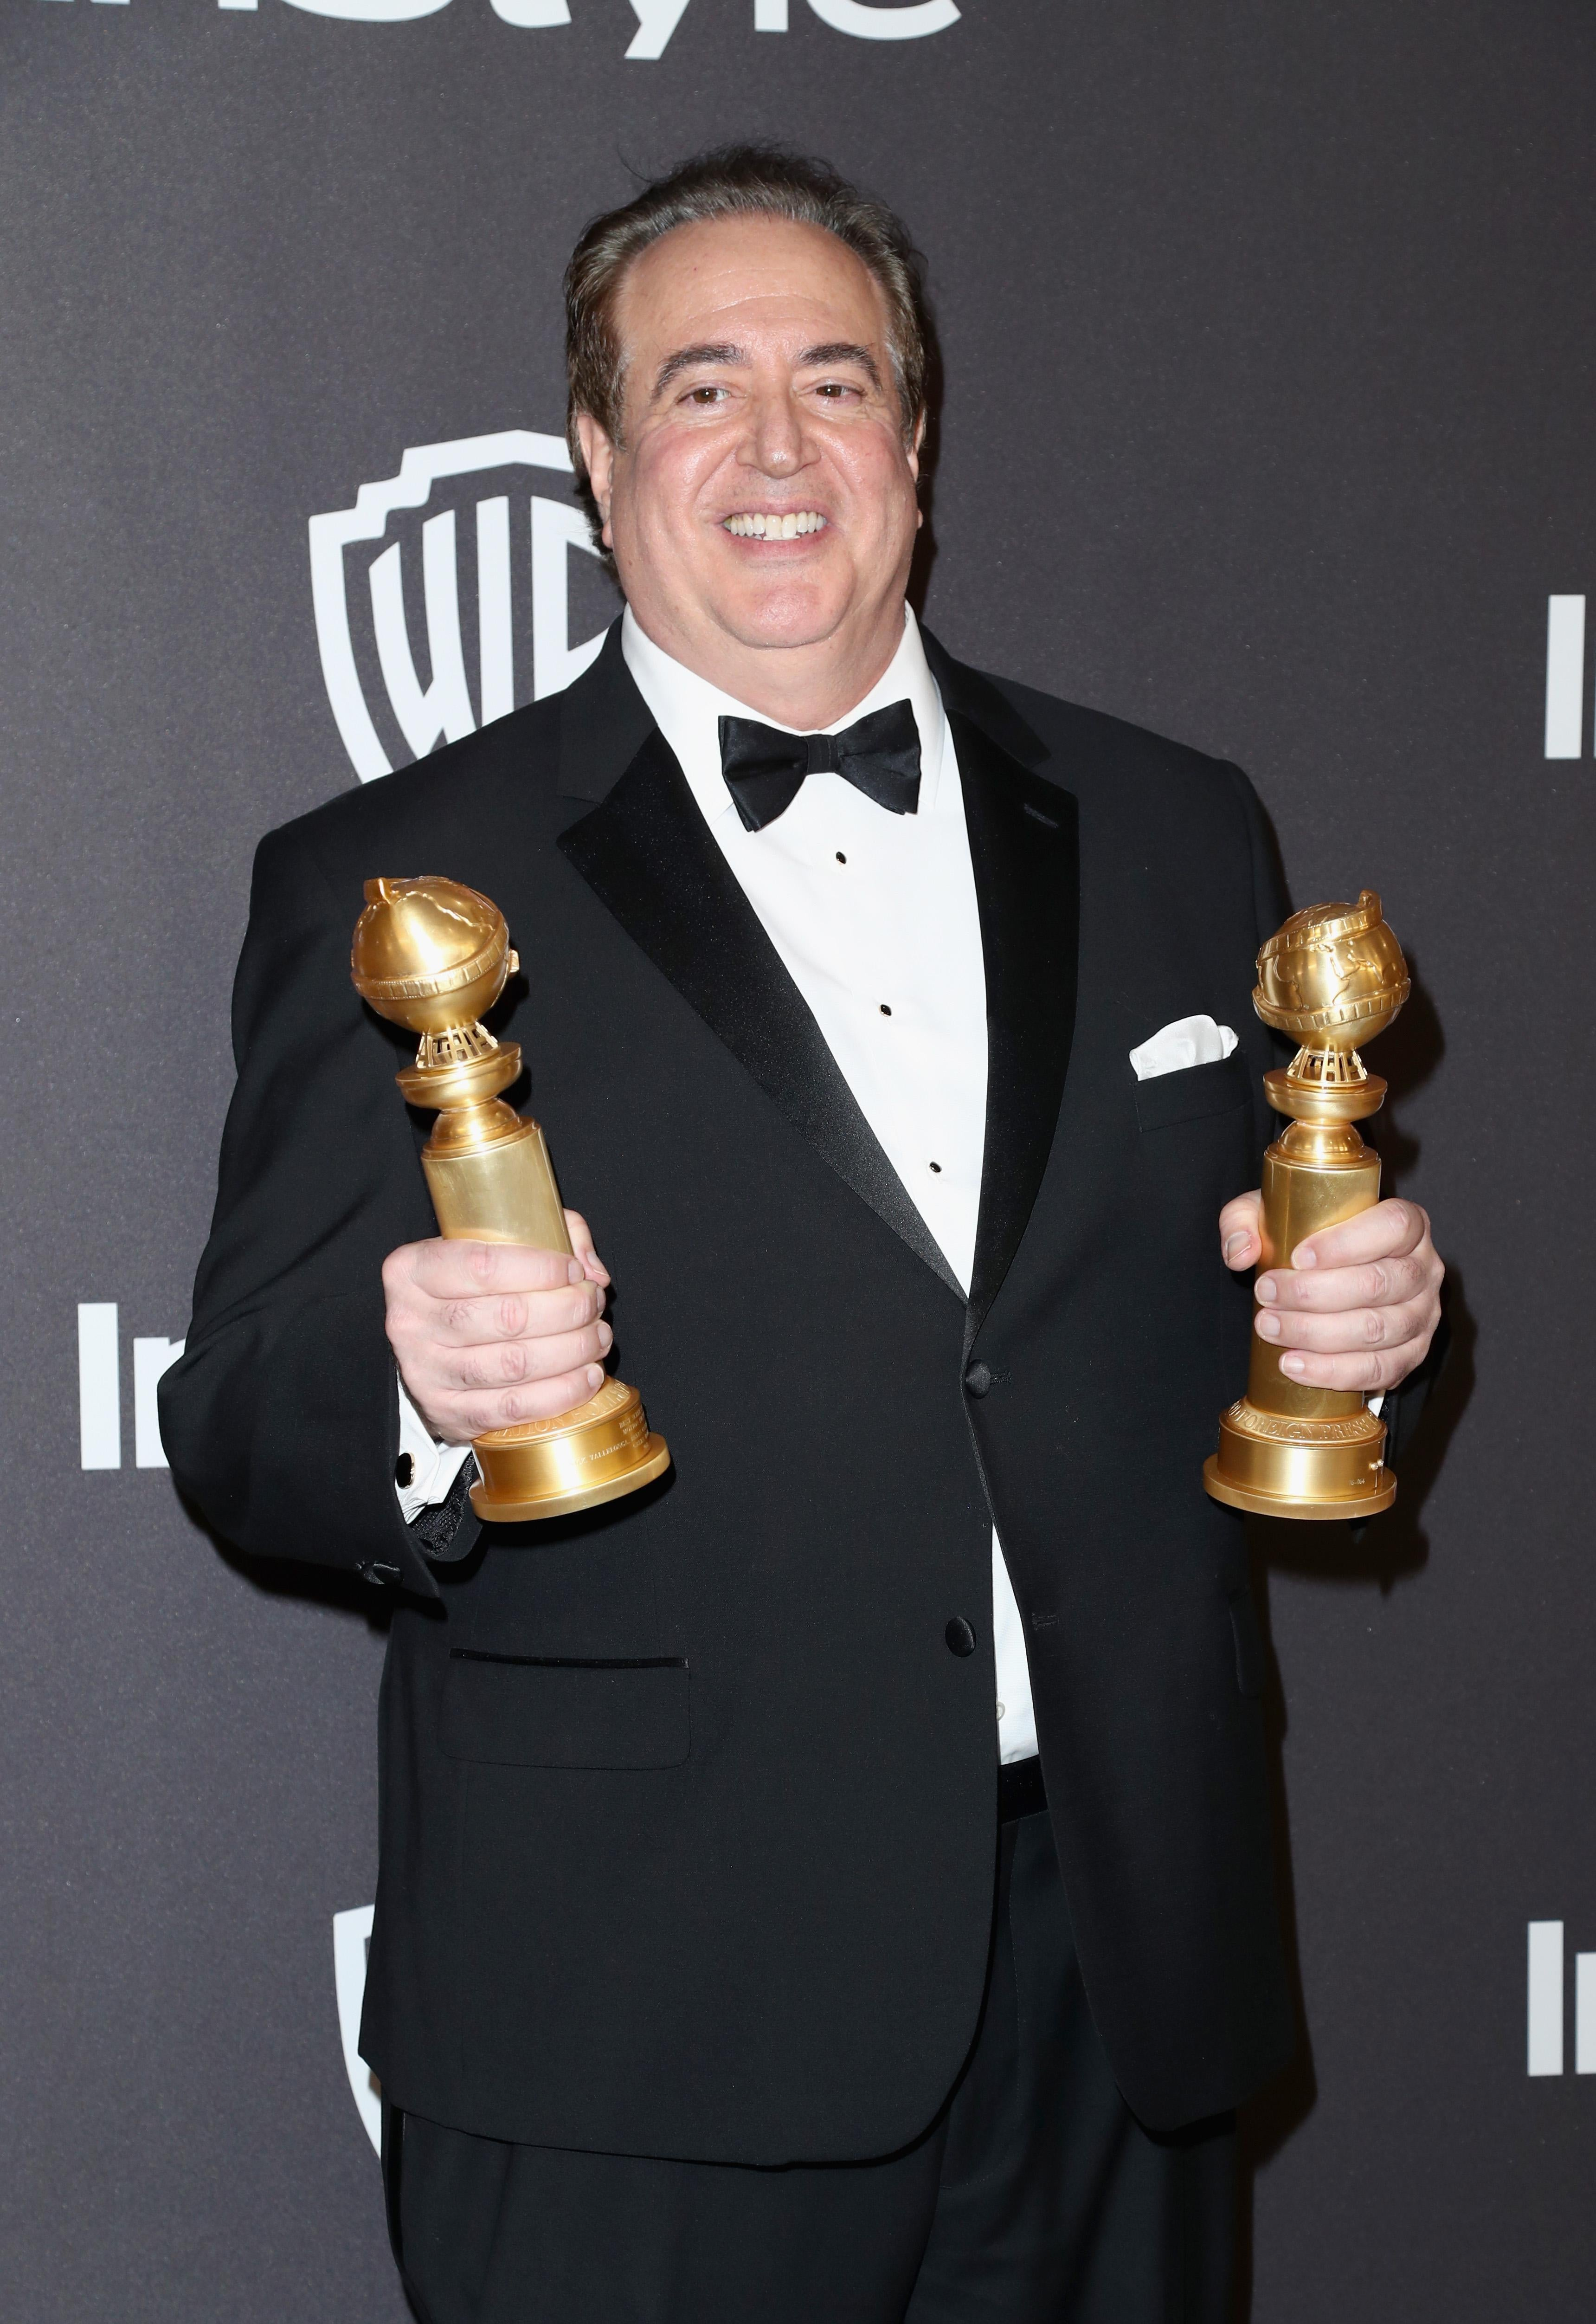 Nick Vallelonga holding his Golden Globes.